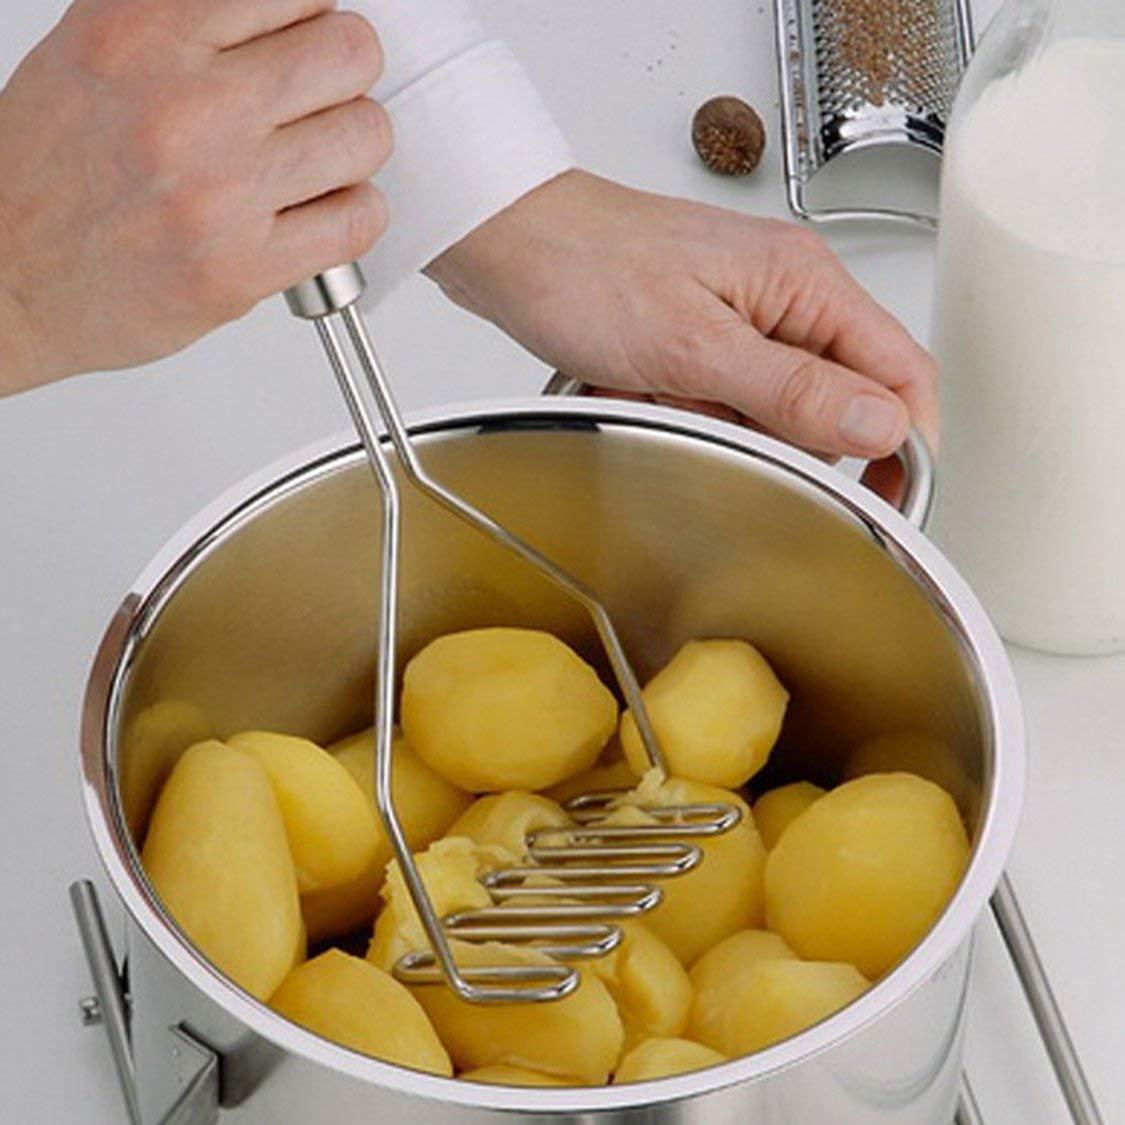 Stainless Steel Potato Ricer Wavy Potato Mud Maker Masher Vegetable Fruit Crusher Portable Kitchen Gadgets Tool